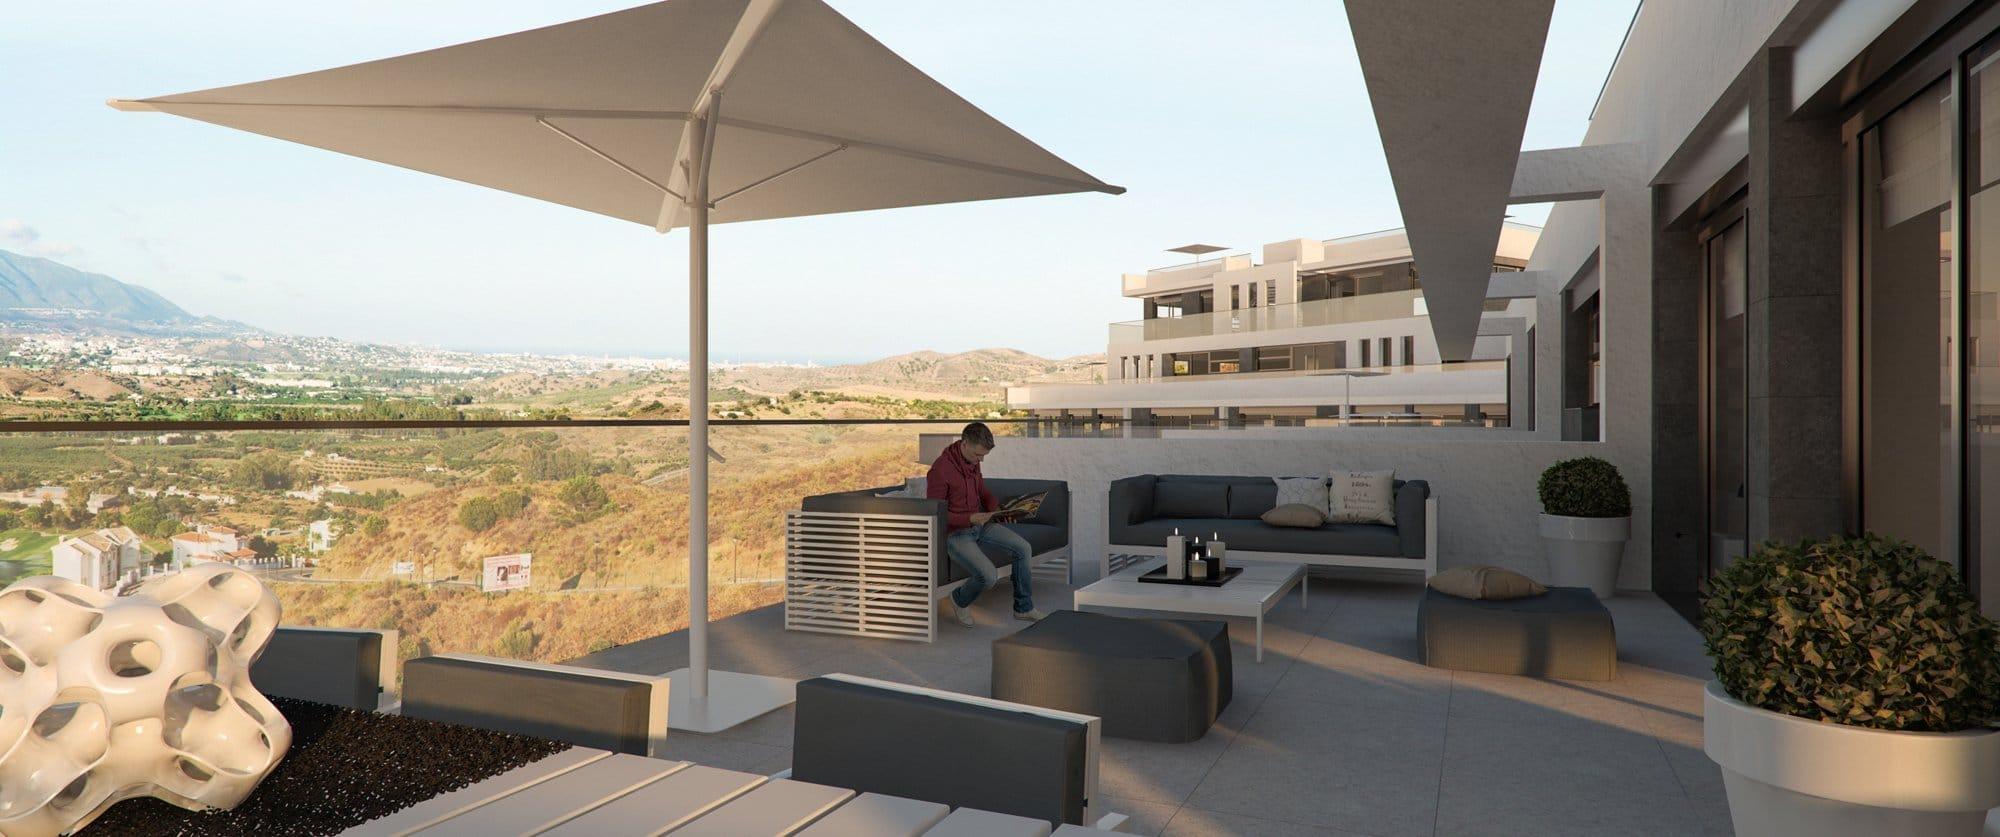 Render exterior terrace by GAYARRE infografia